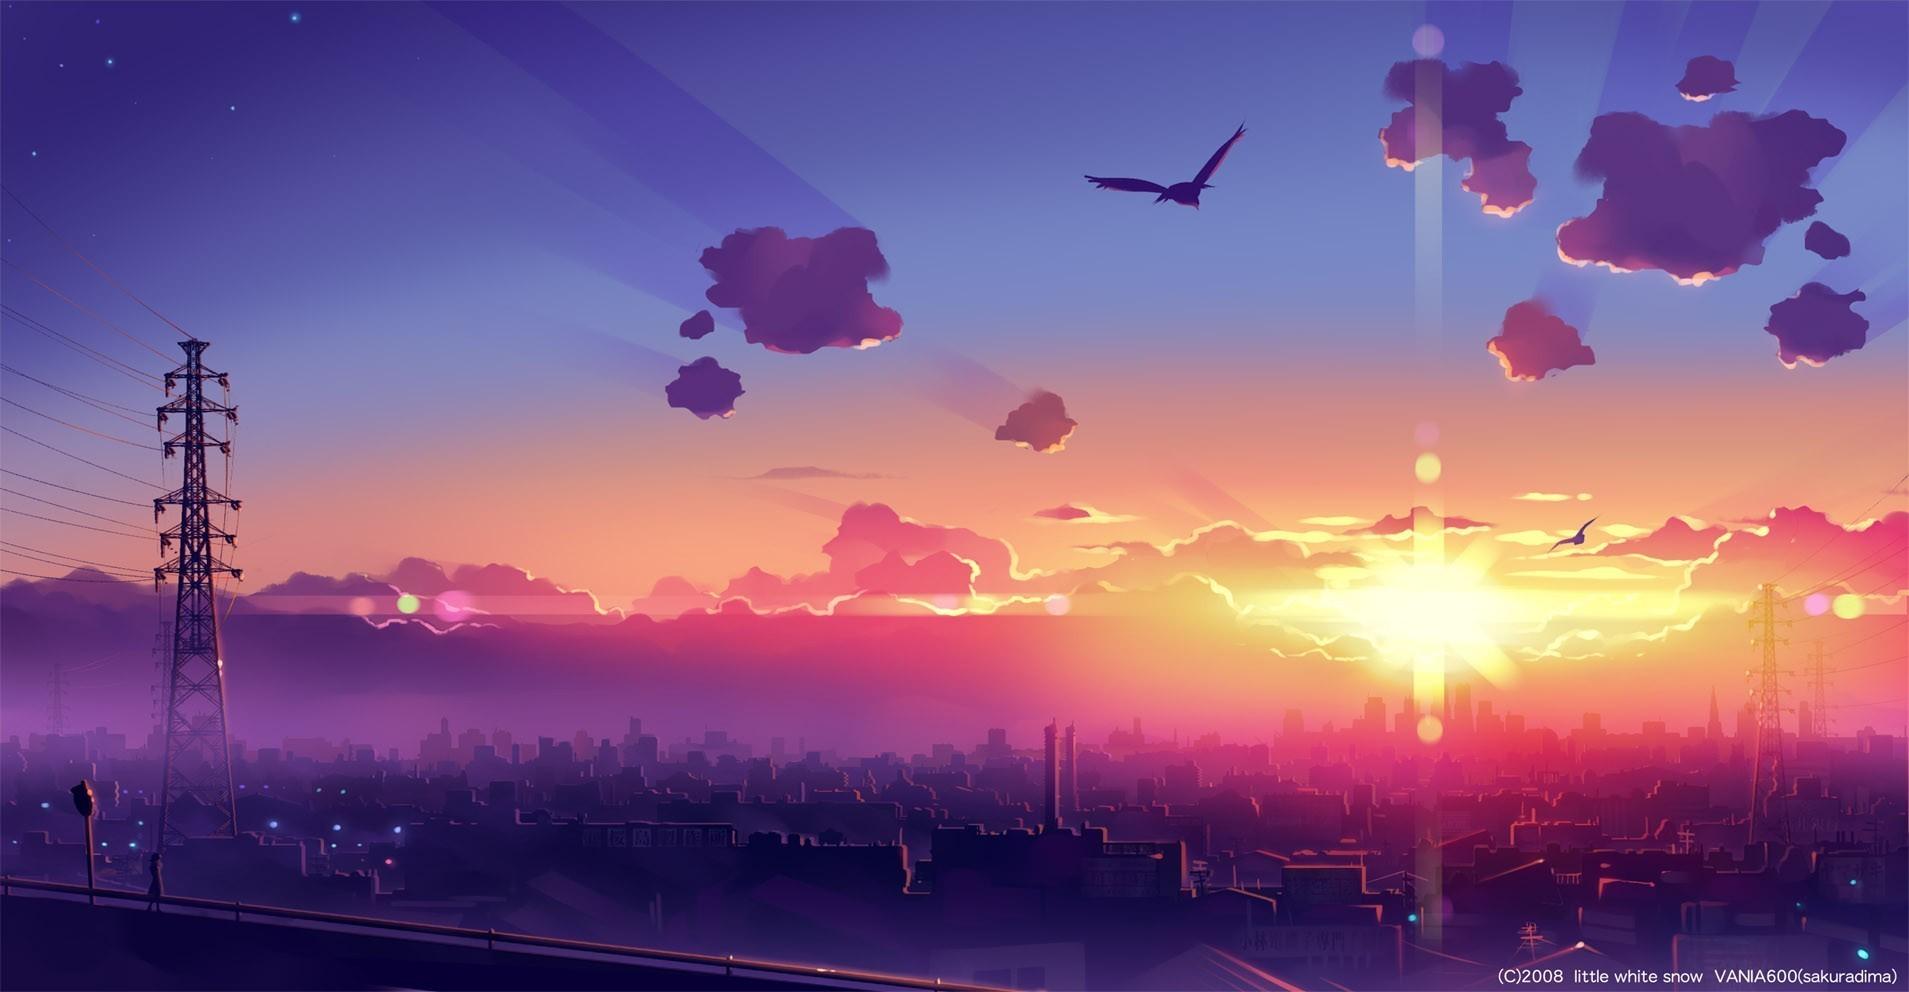 Sunlight Sunset Architecture Anime Building Reflection Sky Artwork Sunrise Manga Evening Morning Horizon Atmosphere Dusk Dawn